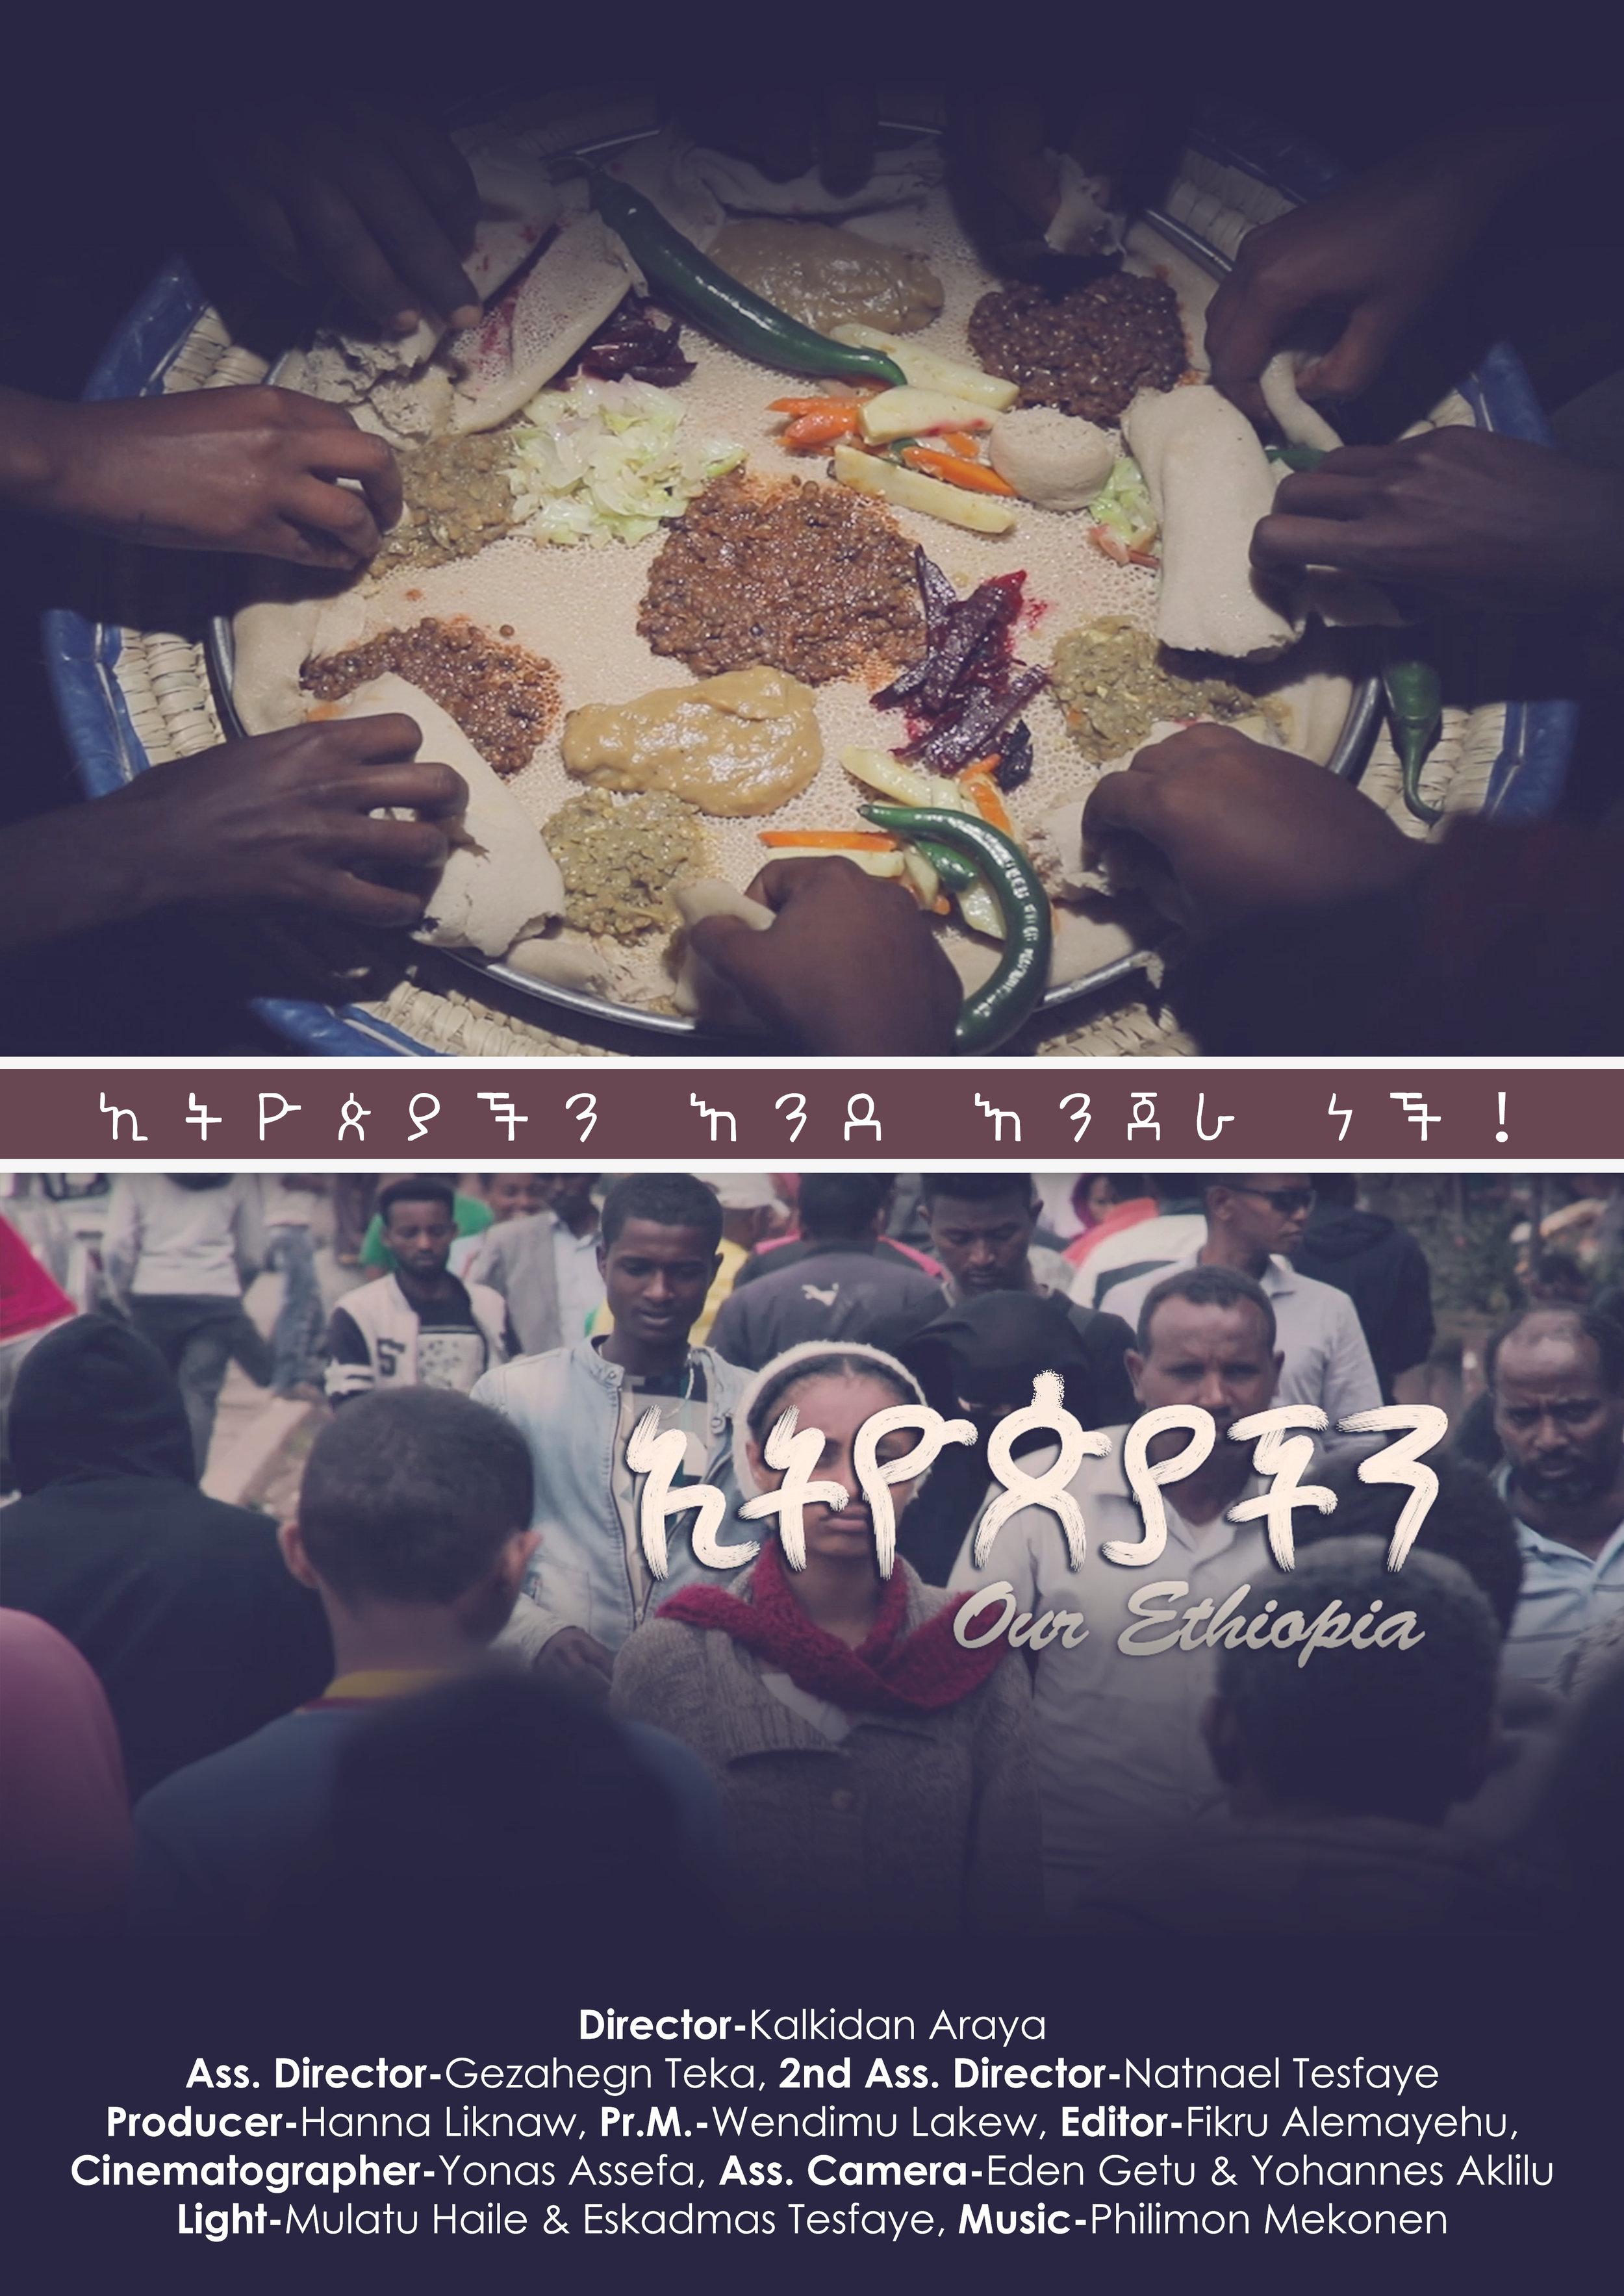 Our Ethiopia - kalkidan araya yesuf.jpg